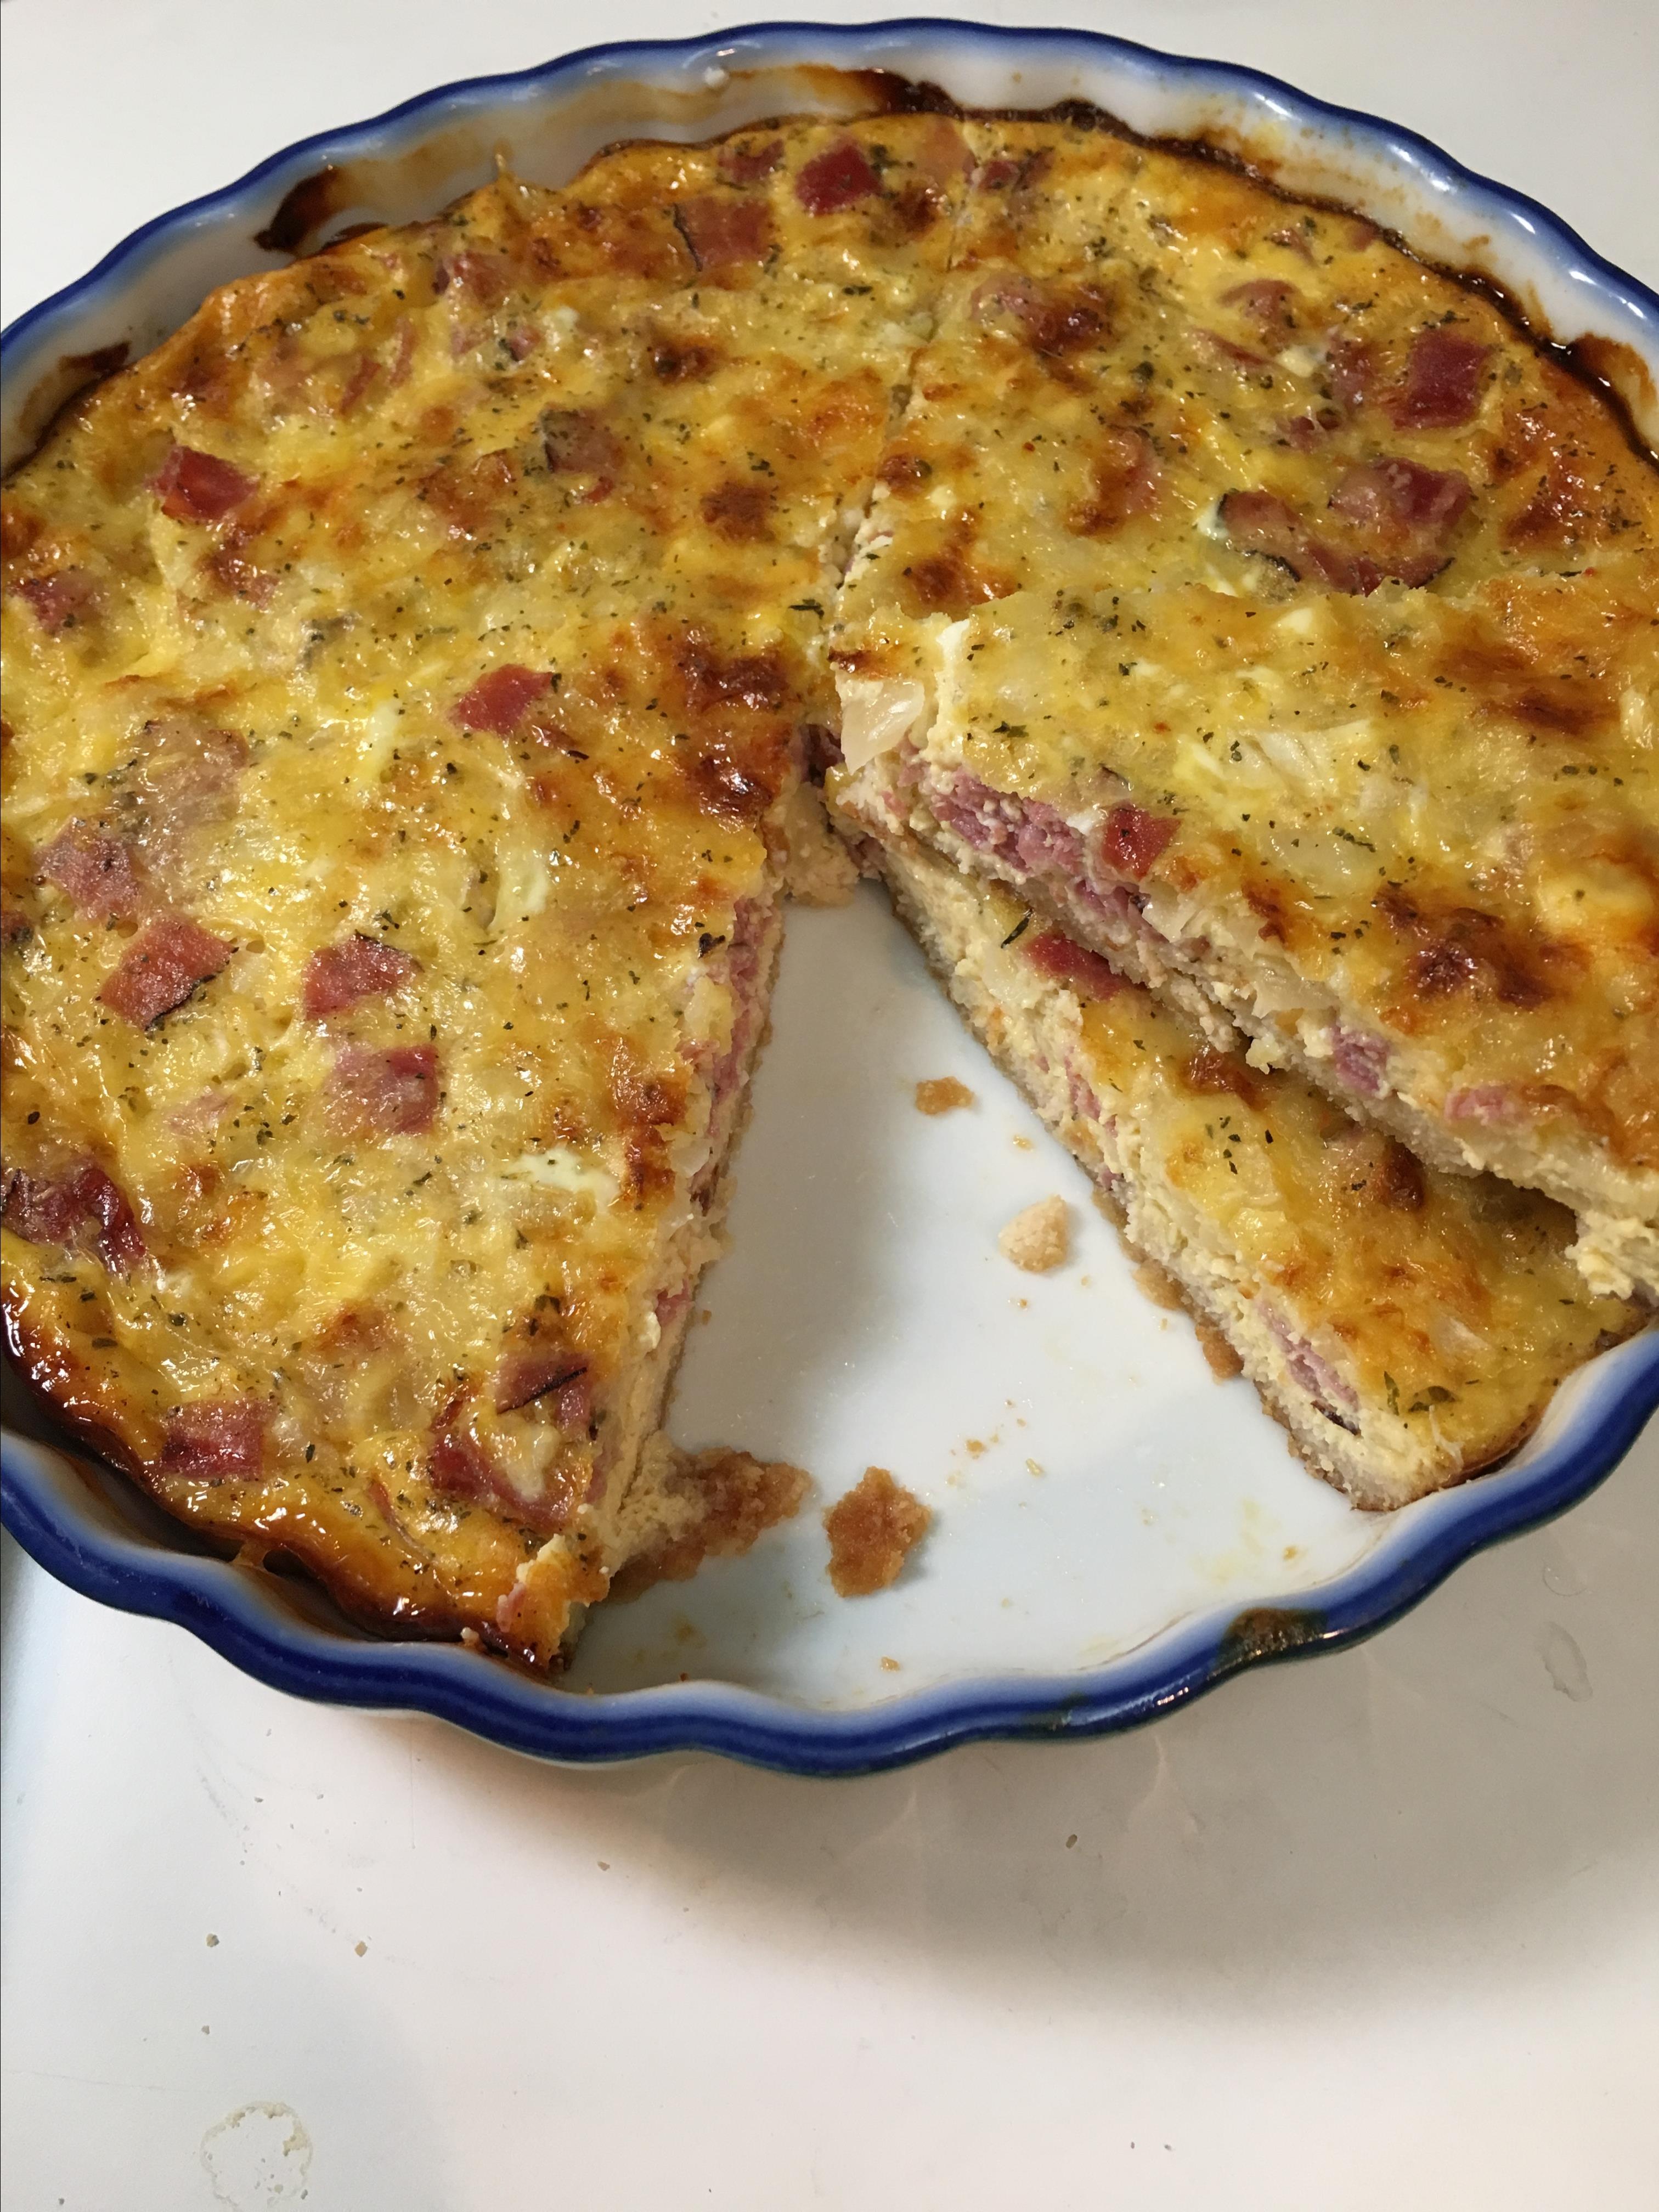 Low Carb and Gluten Free Quiche Lorraine PRESSEDFORTIME